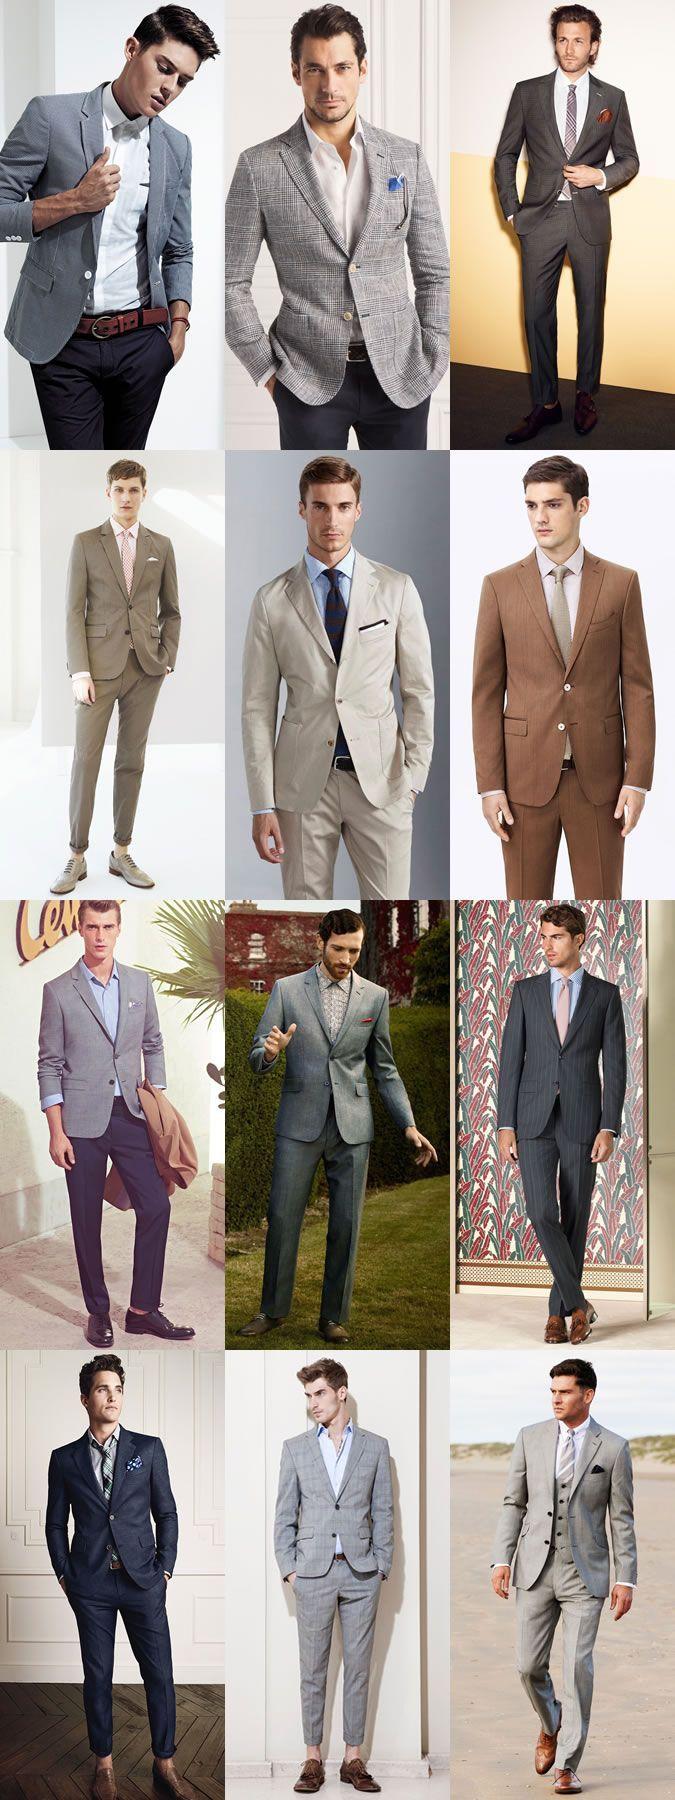 25 best ideas about summer wedding men on pinterest for Dress suitable for wedding guest